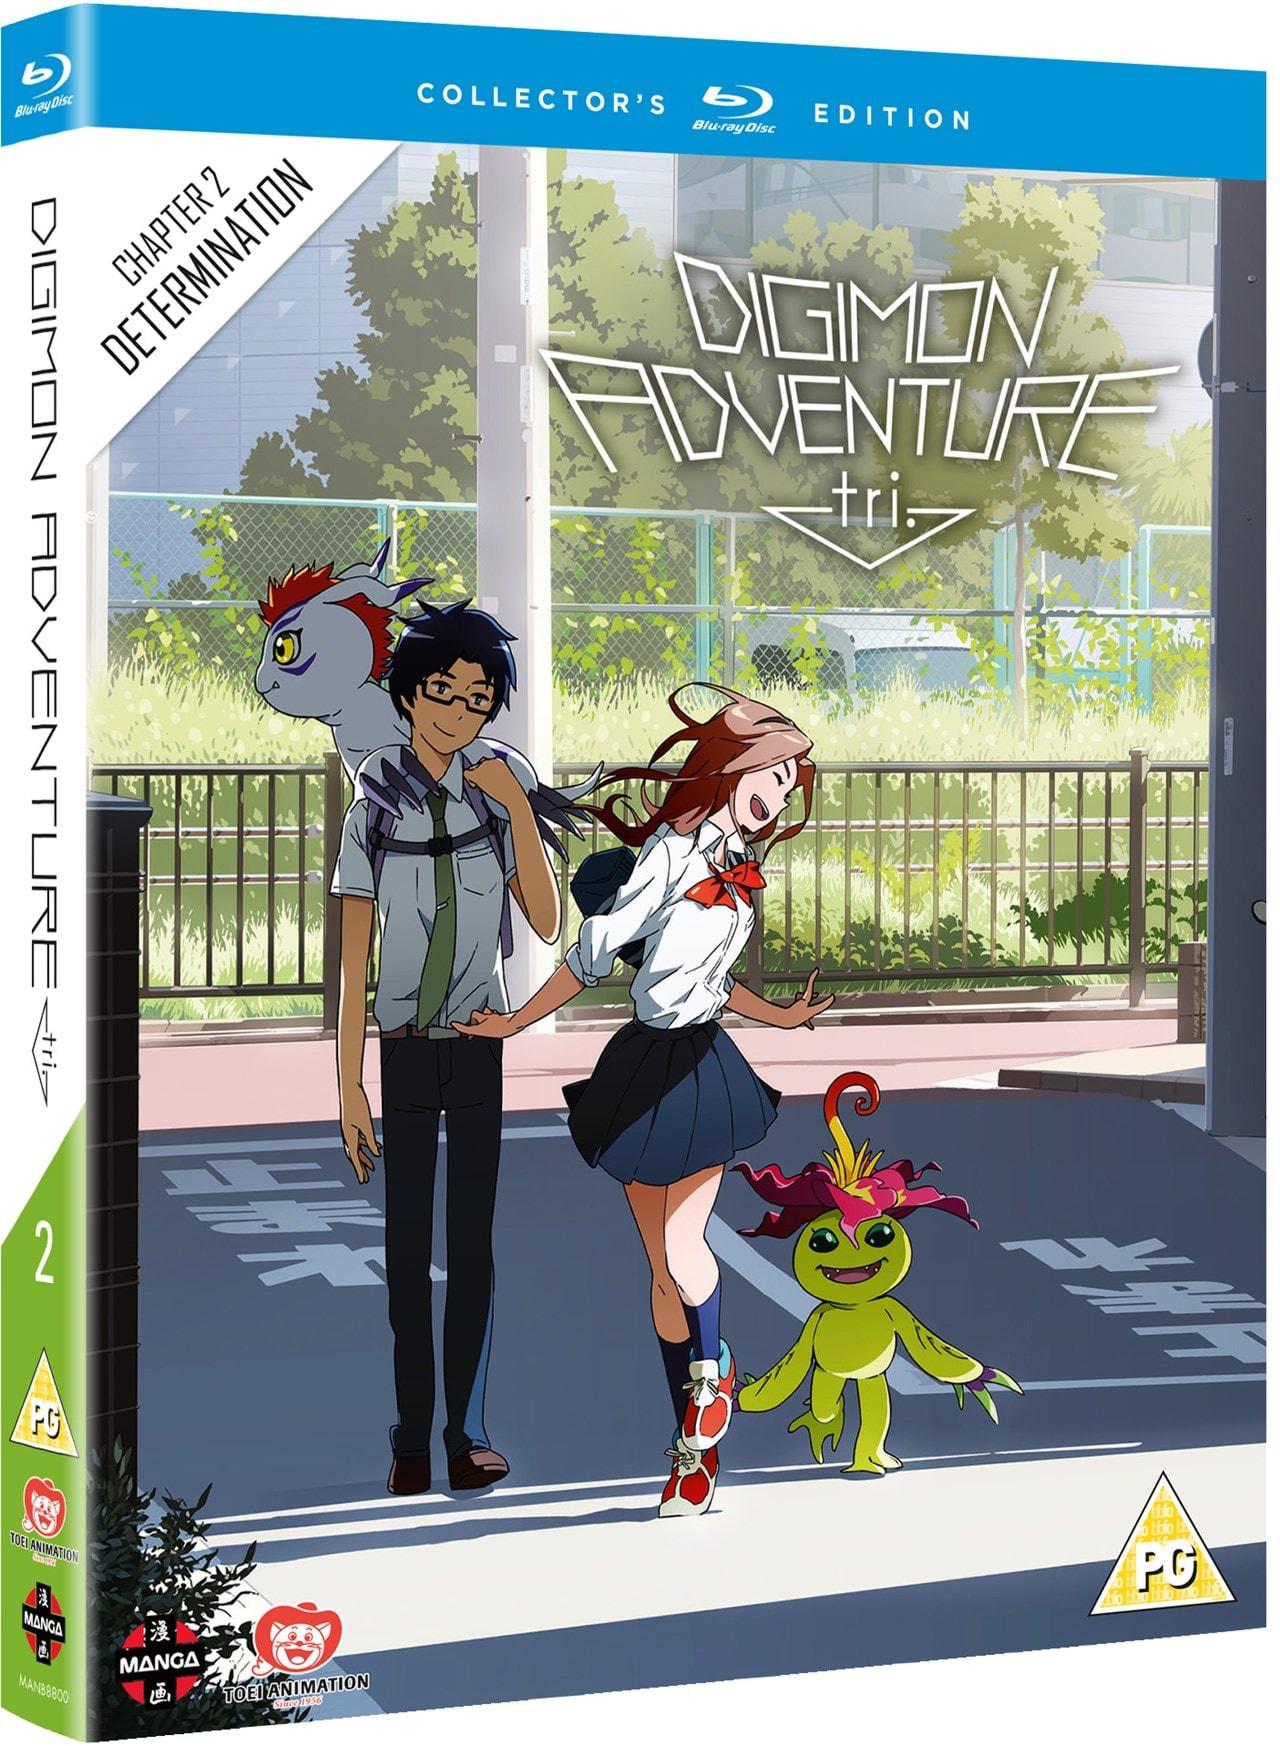 Digimon Adventure Tri: Chapter 2 - Determination - 2